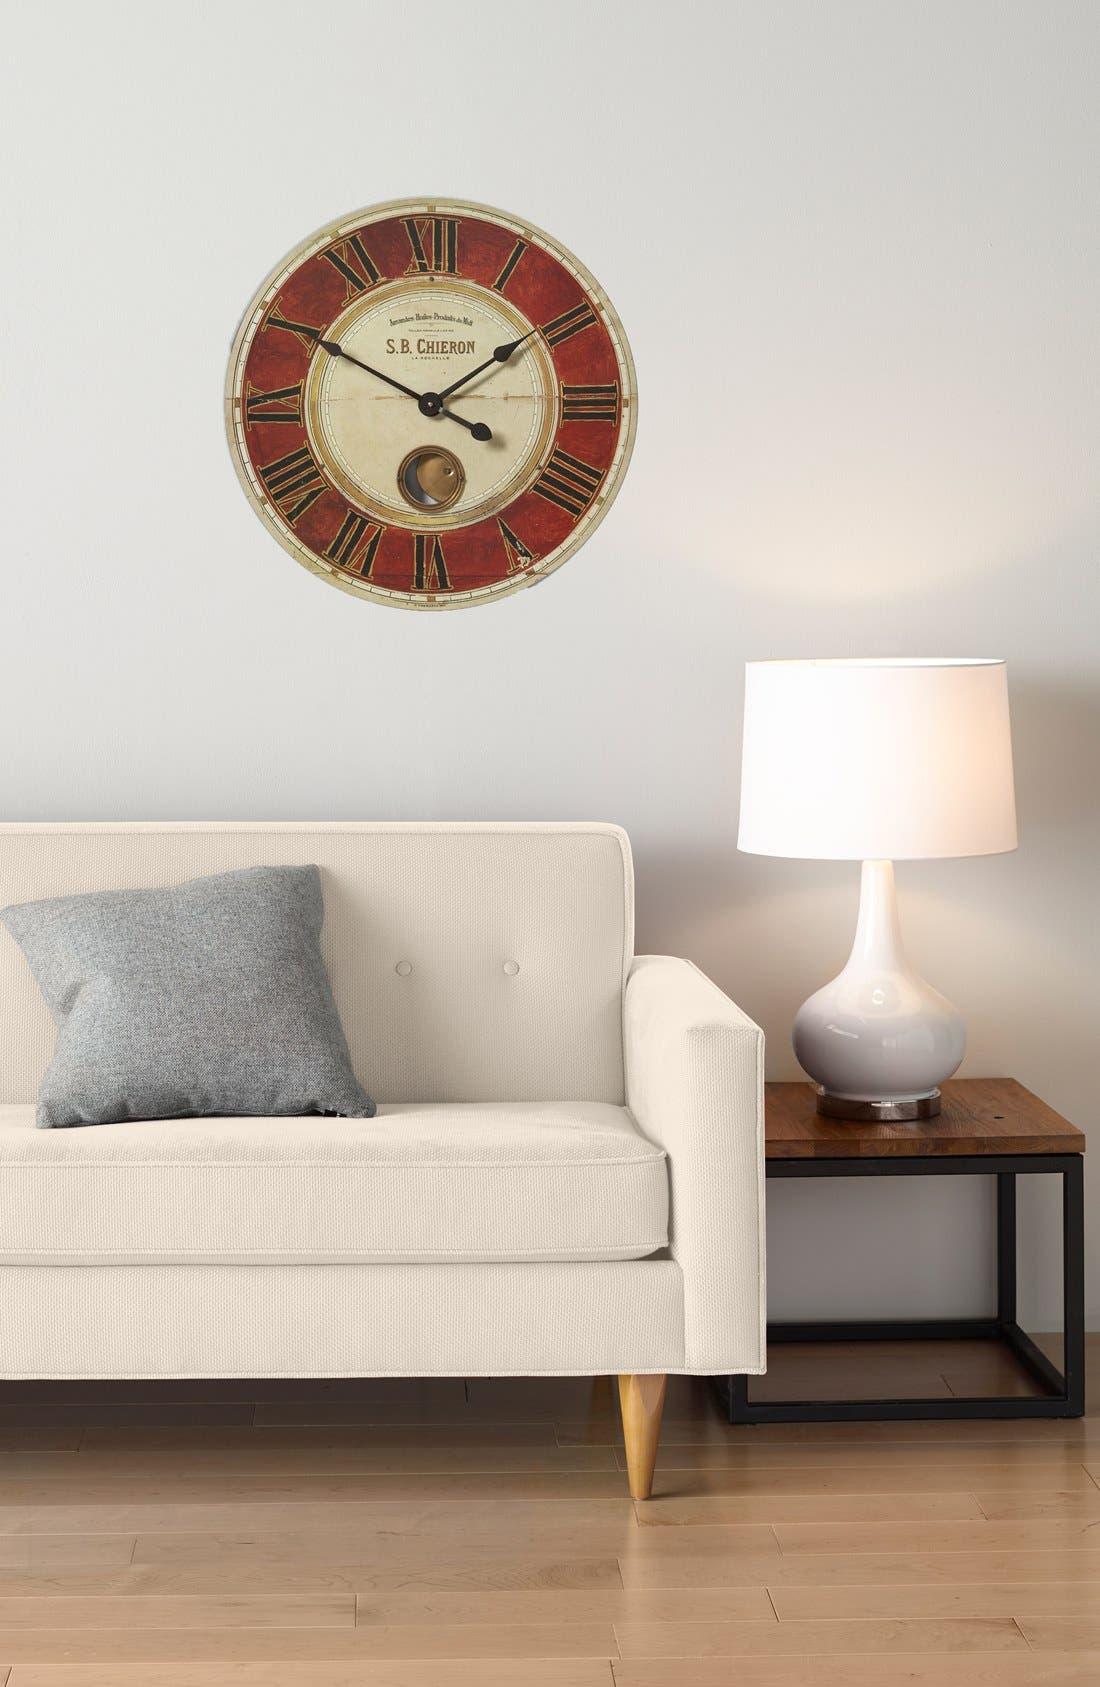 Alternate Image 2  - Uttermost 'Chieron' Wall Clock